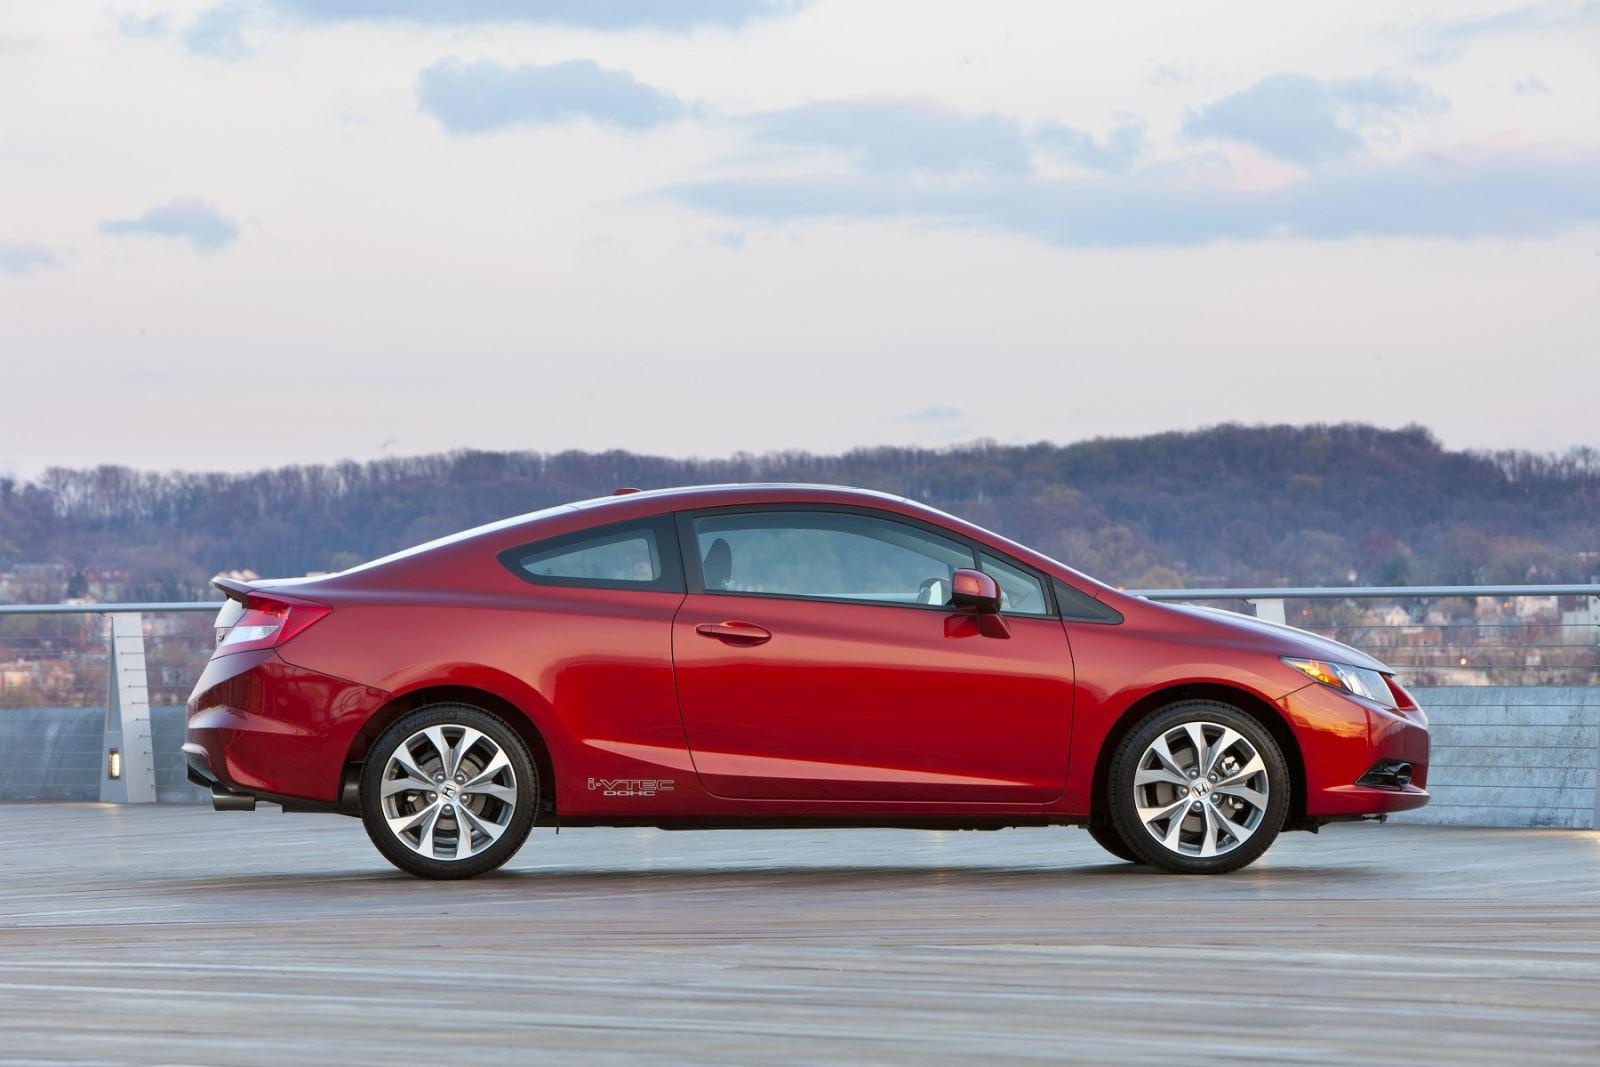 2013 Honda Civic Si Coupe Review Carponents